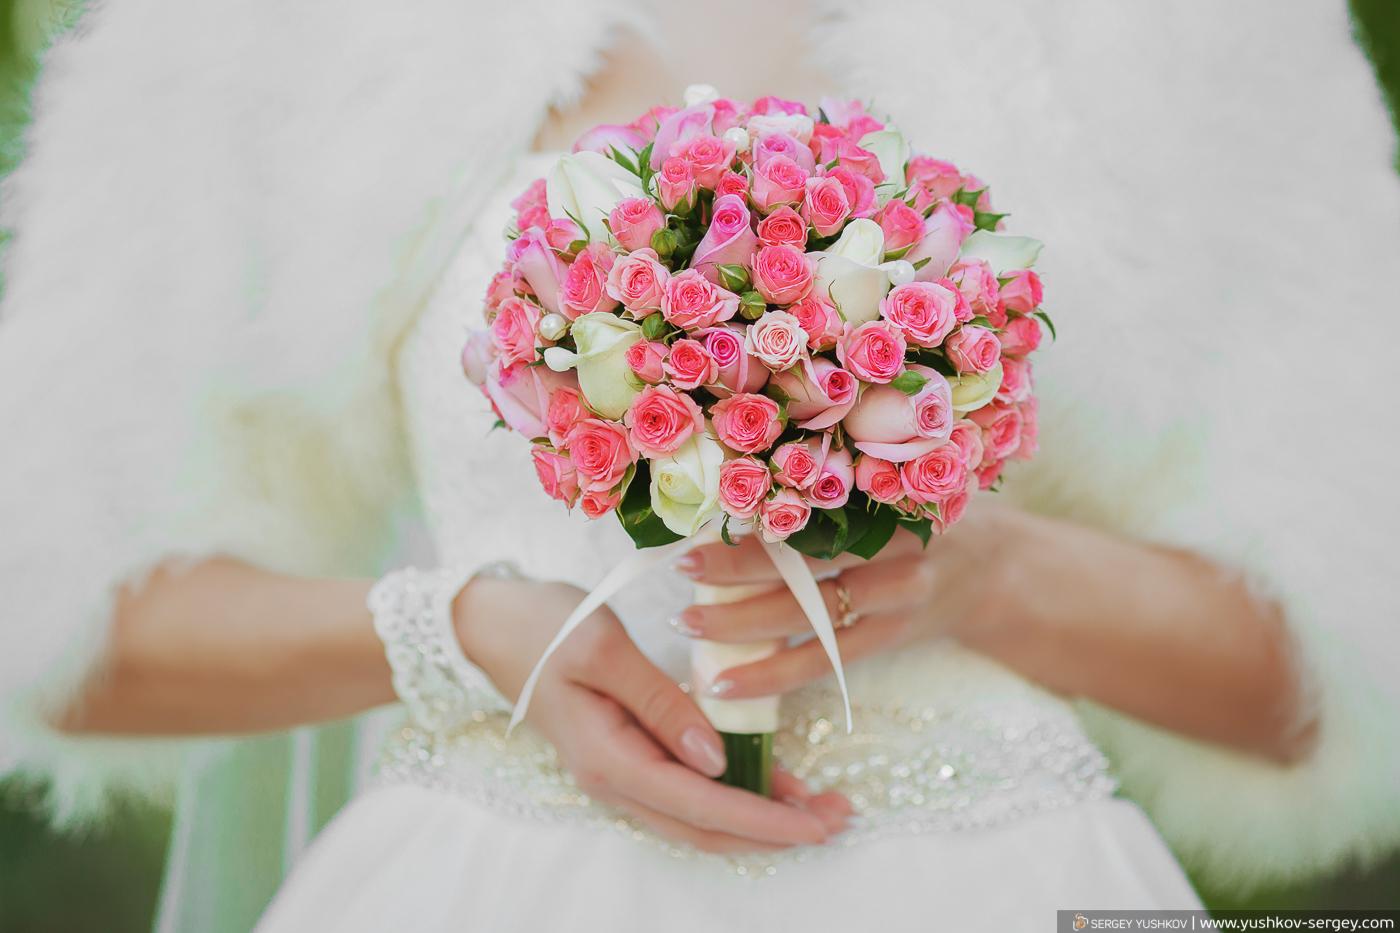 Bouquets of our brides